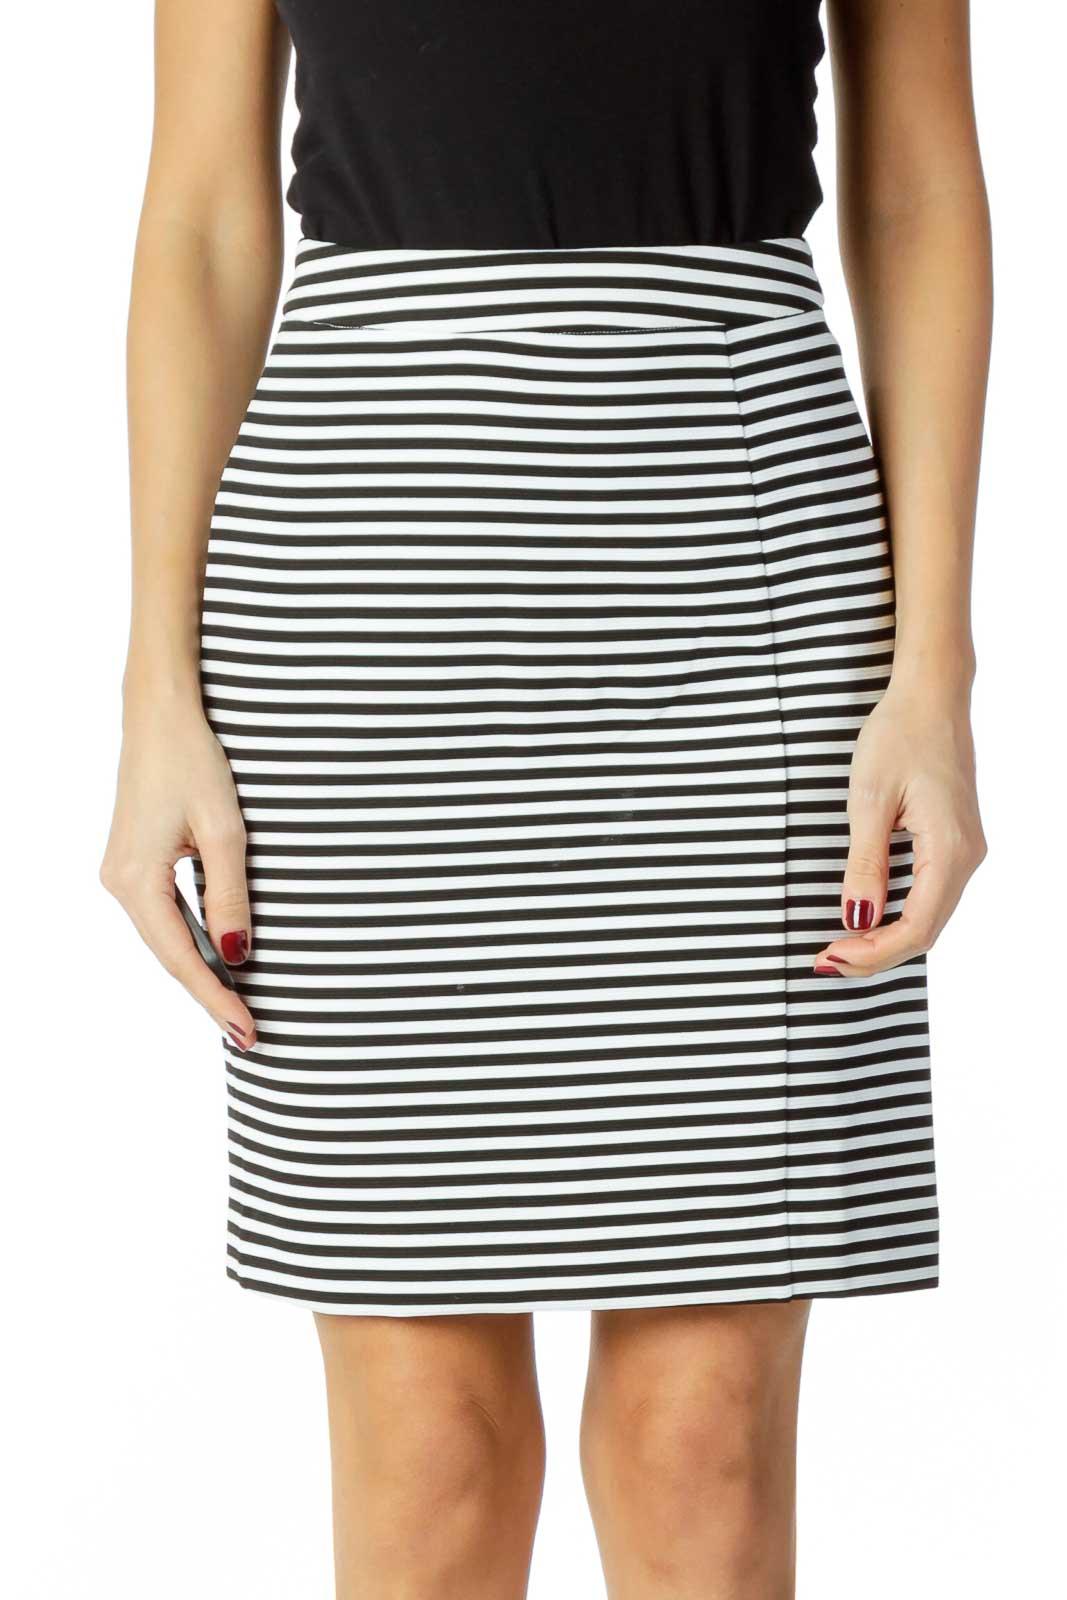 Black White Striped Pencil Skirt Front